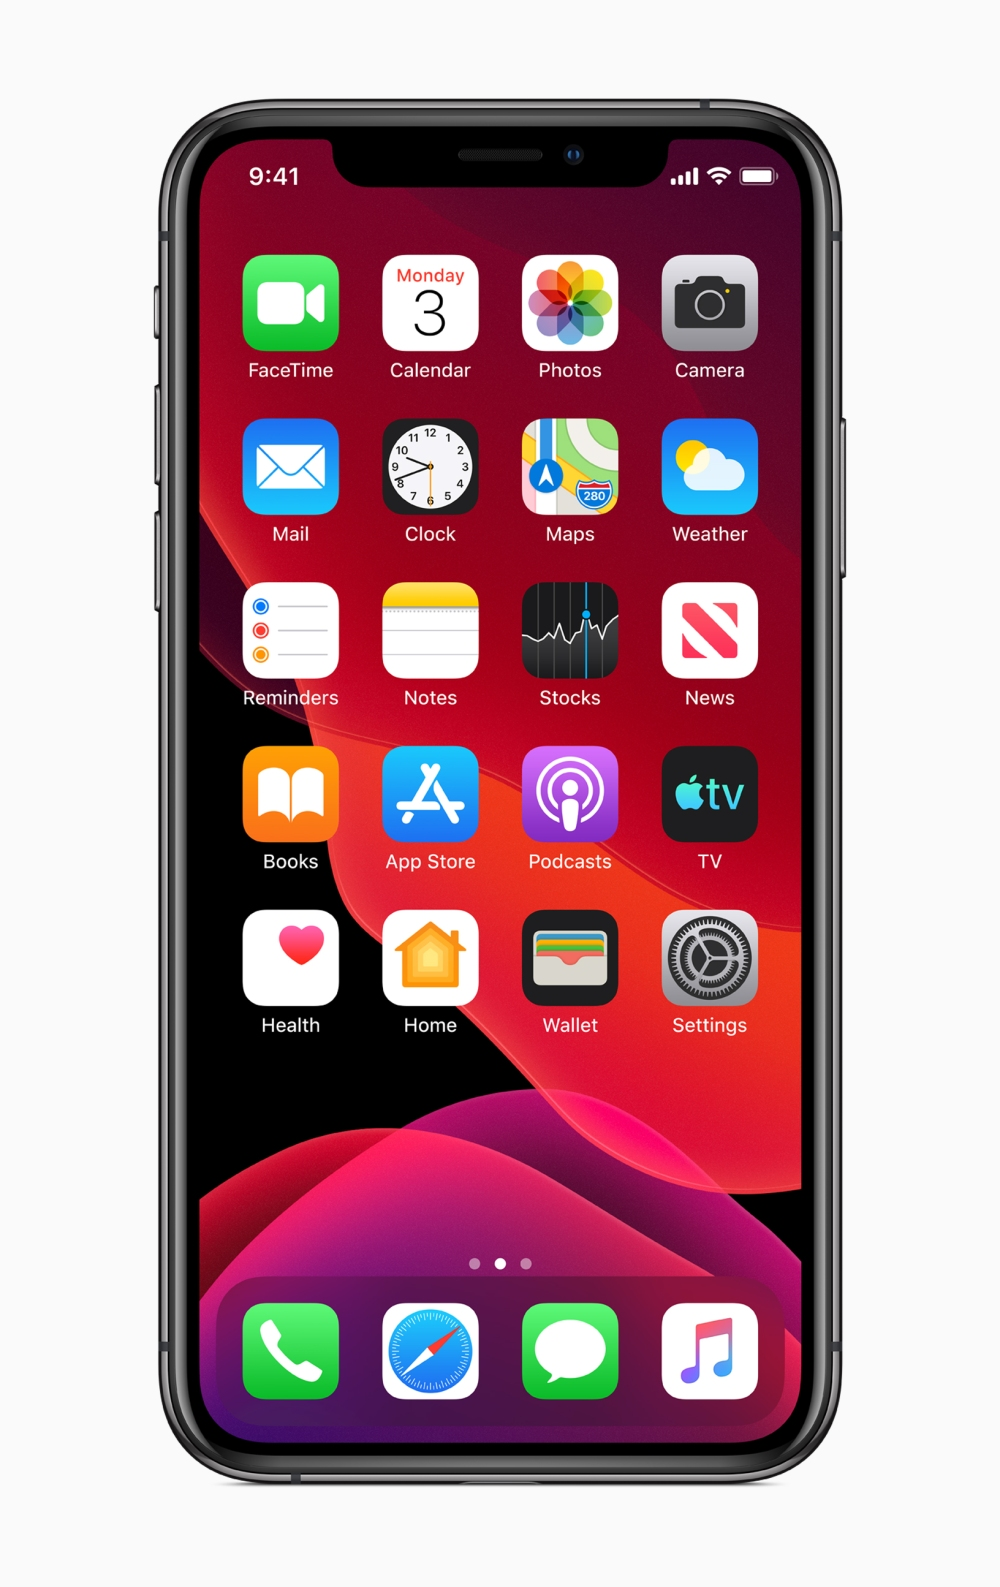 Apple-ios-13-home-screen-iphone-xs-06032019